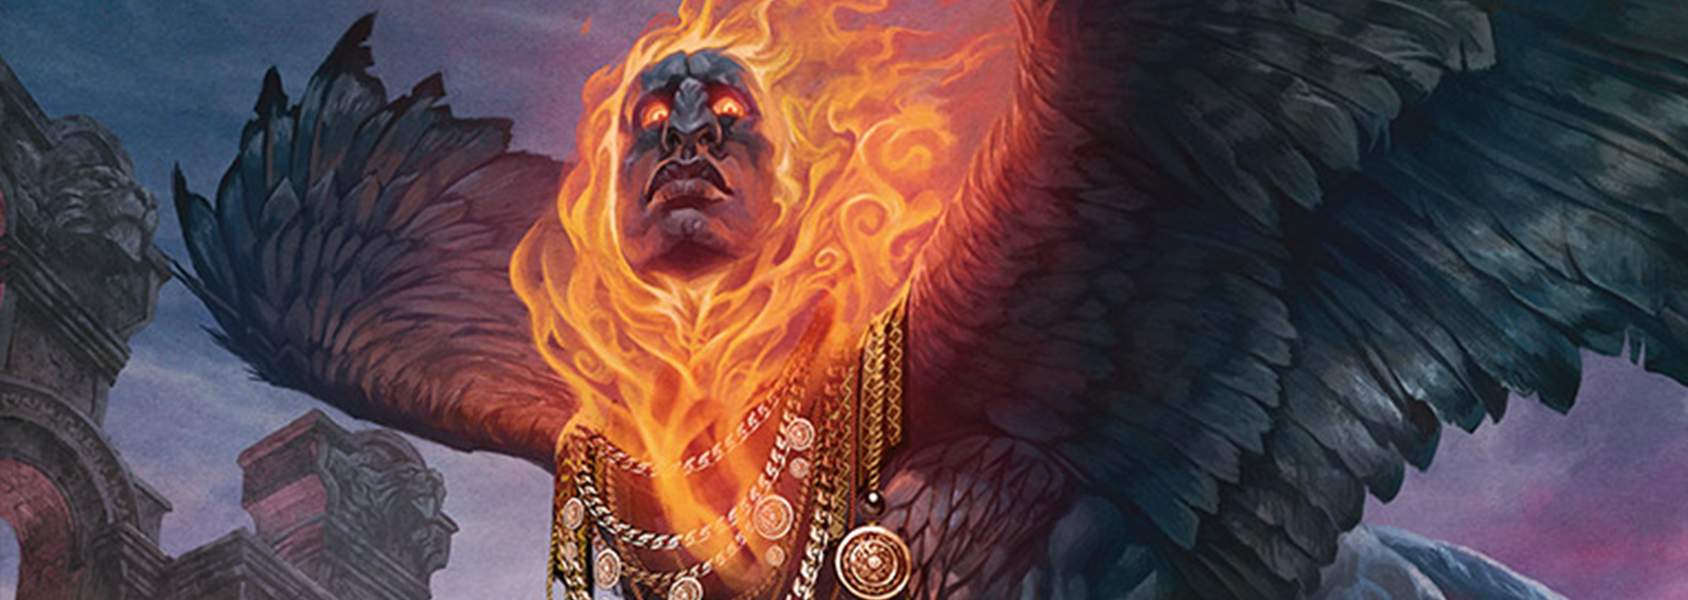 Arjun the Shifting Flame